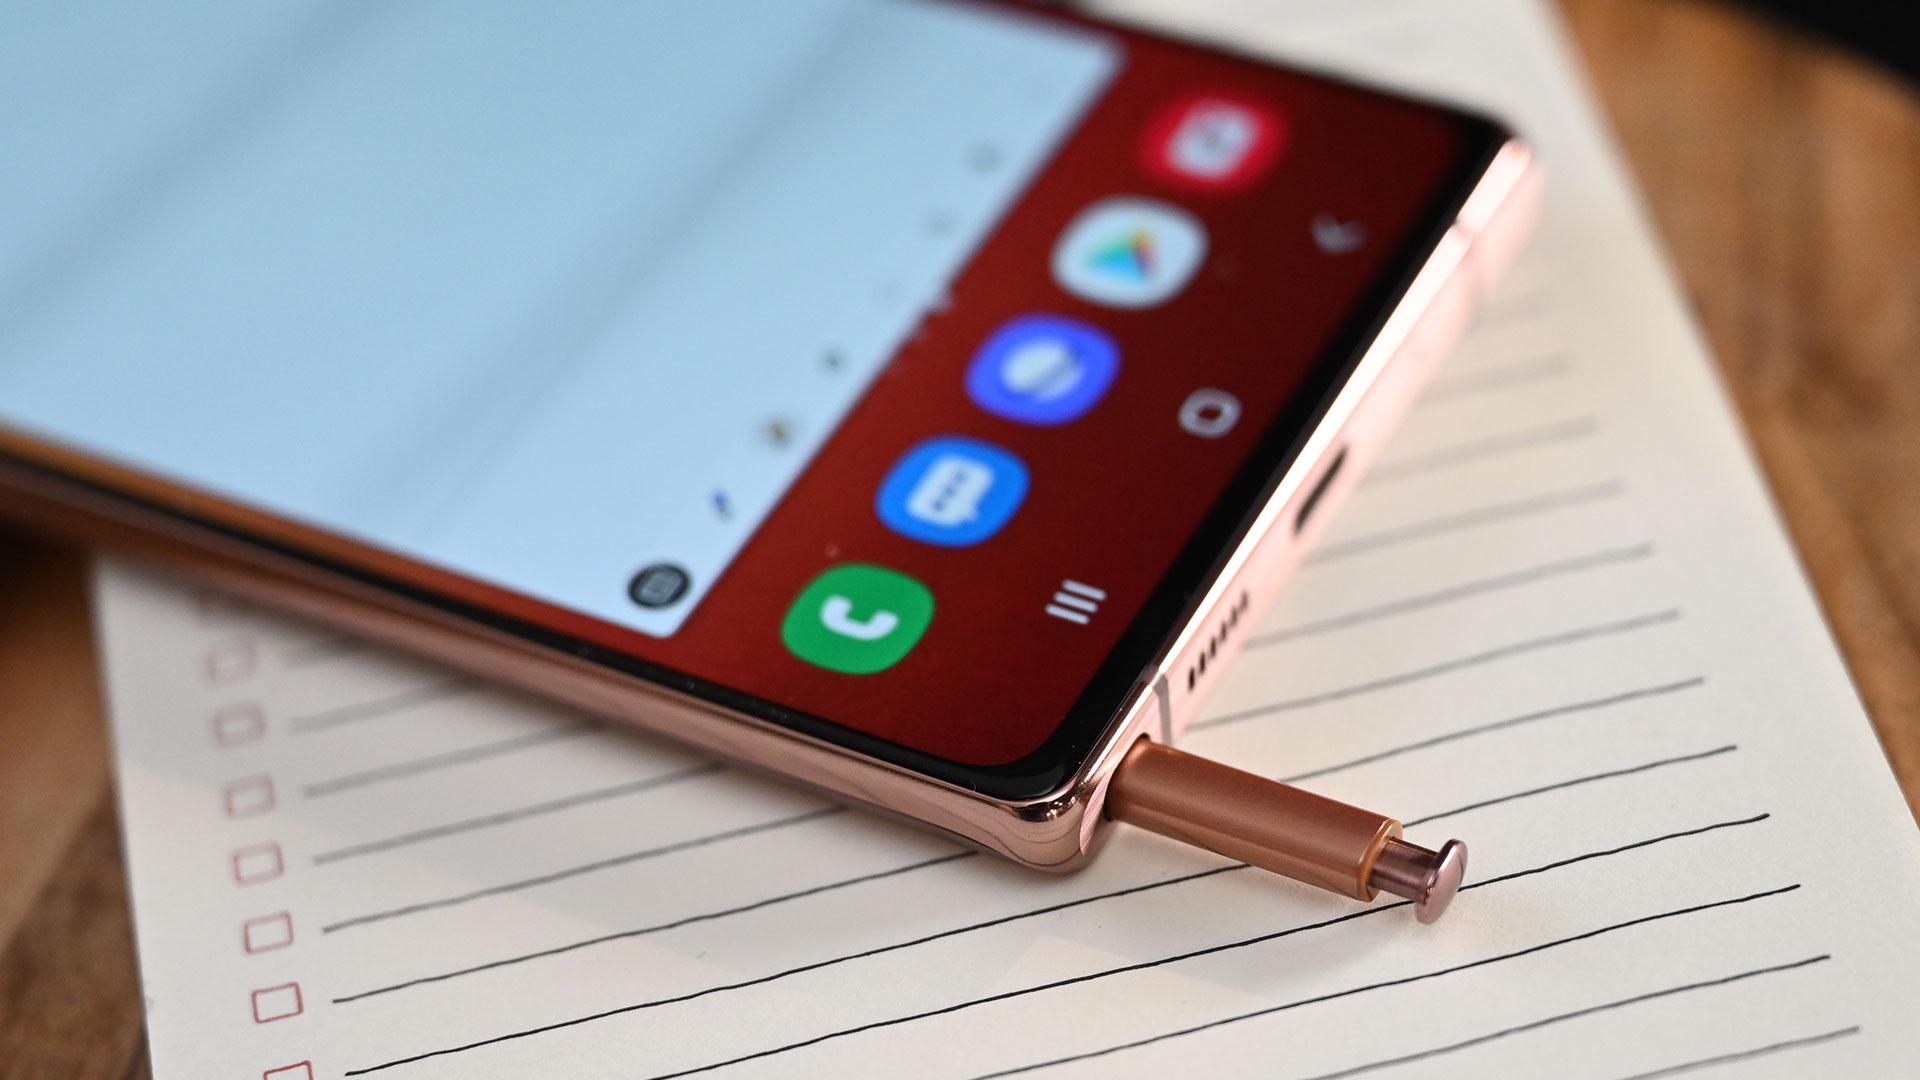 Detalhe da S Pen do Galaxy Note 20. Crédito: Sam Rutherford/Gizmodo